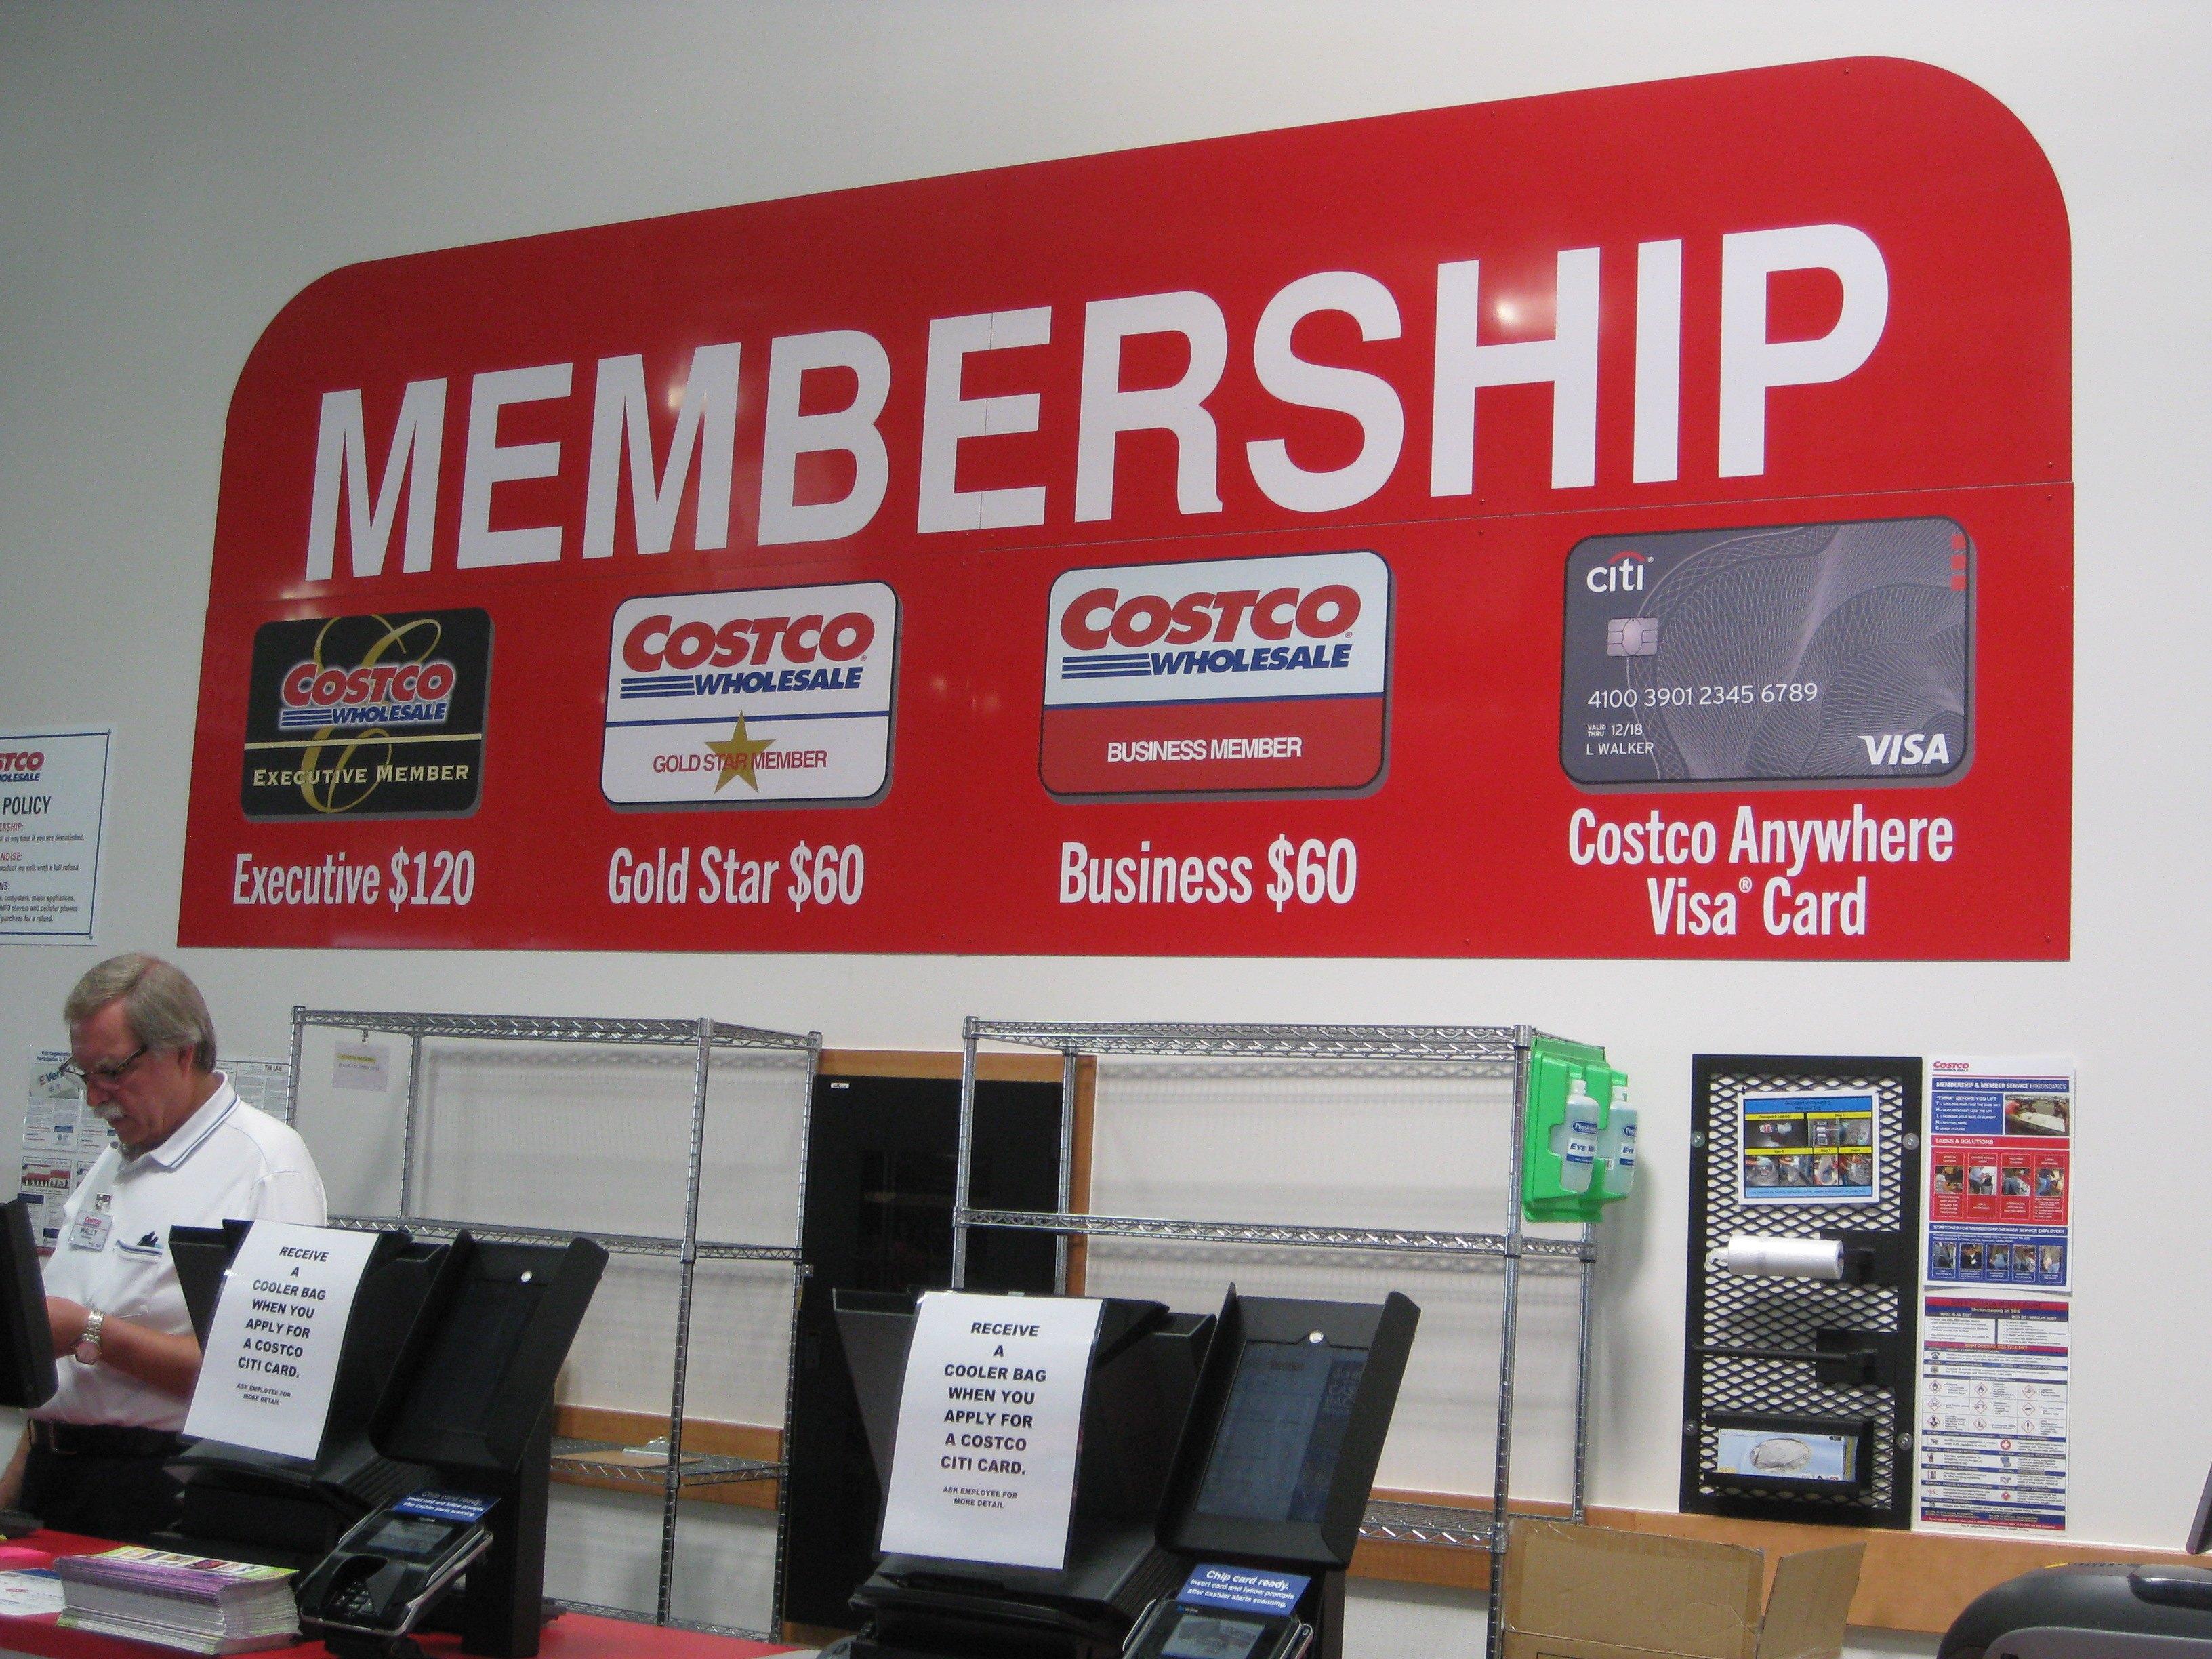 Costco membership desk